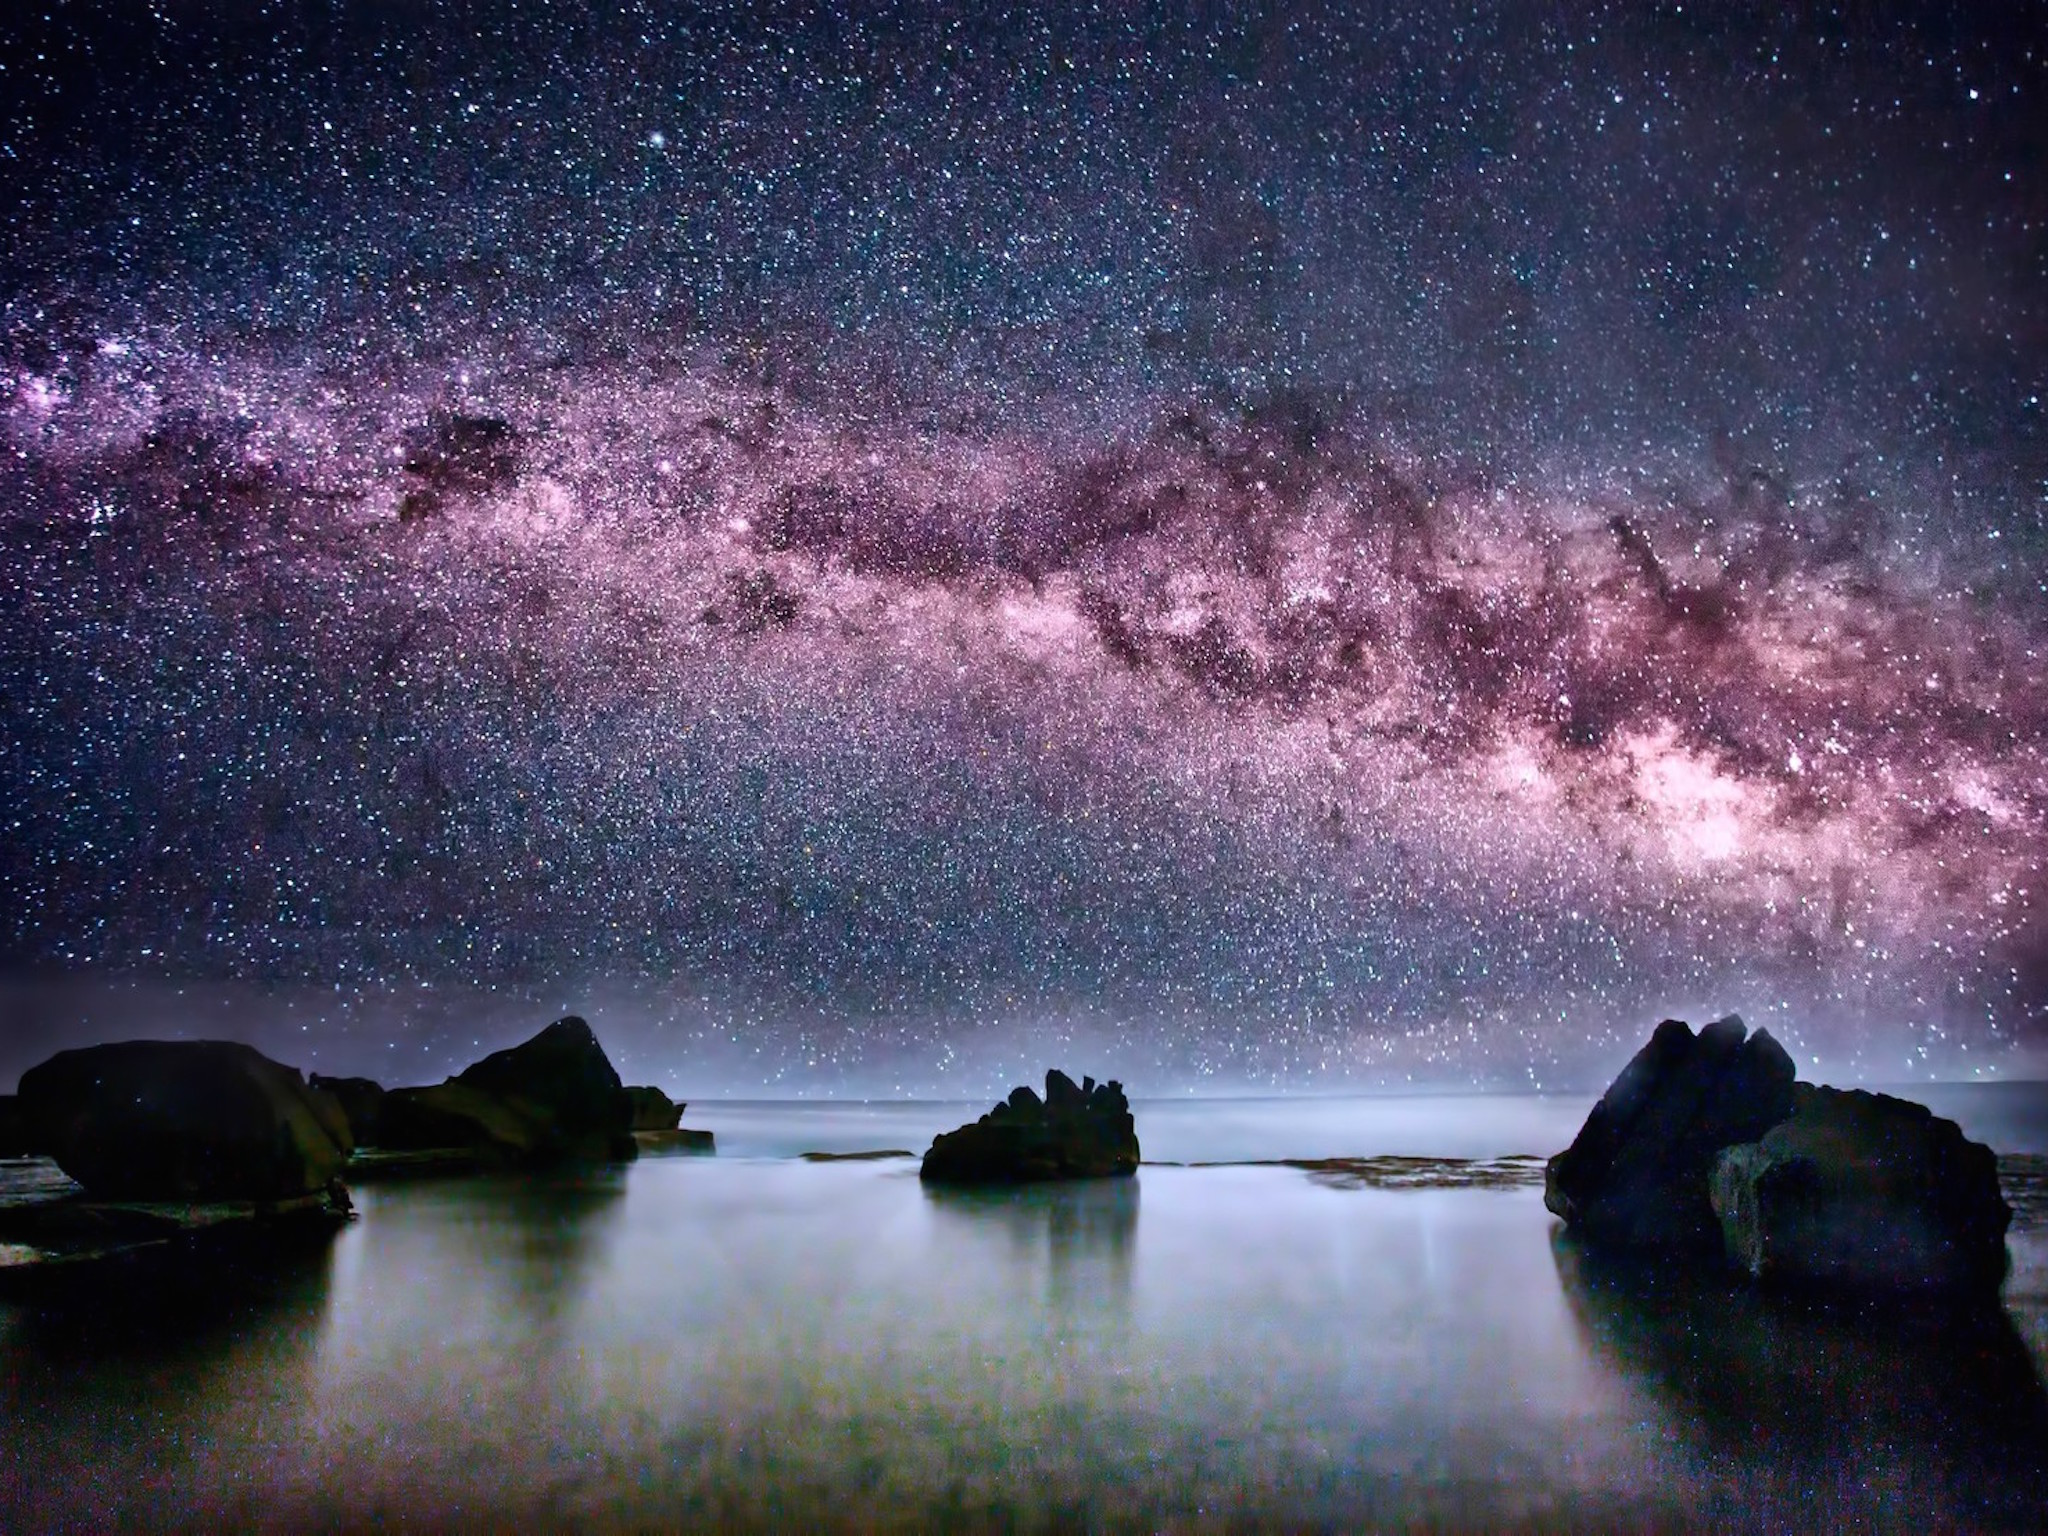 Milky Way Galaxy Wallpaper HD Galaxy Download WallpaperGeeks 2048x1536